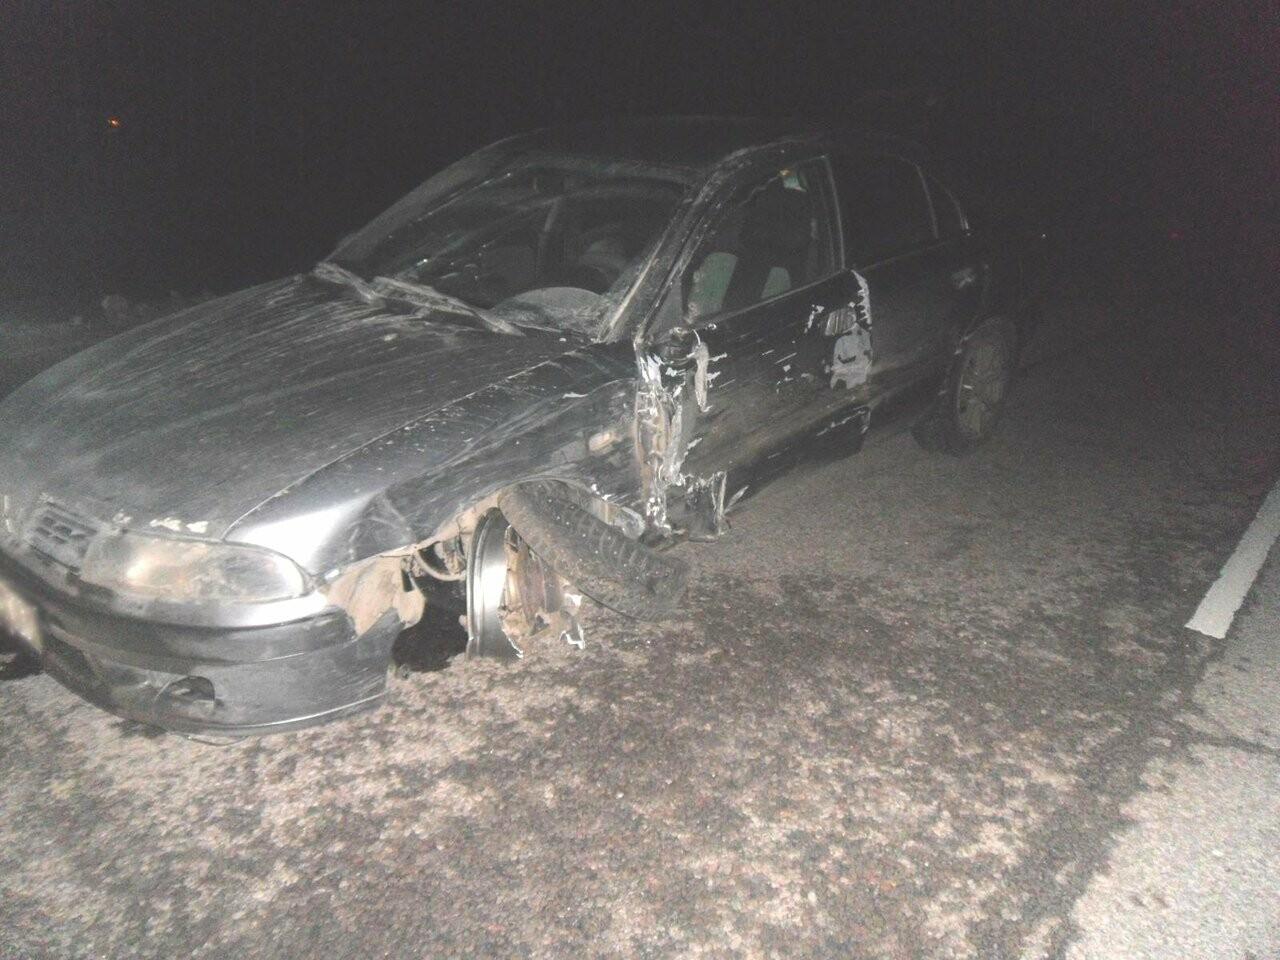 В ДТП на тамбовской трассе погиб человек, фото-1, Фото: пресс-служба ГИБДД по Тамбовской области